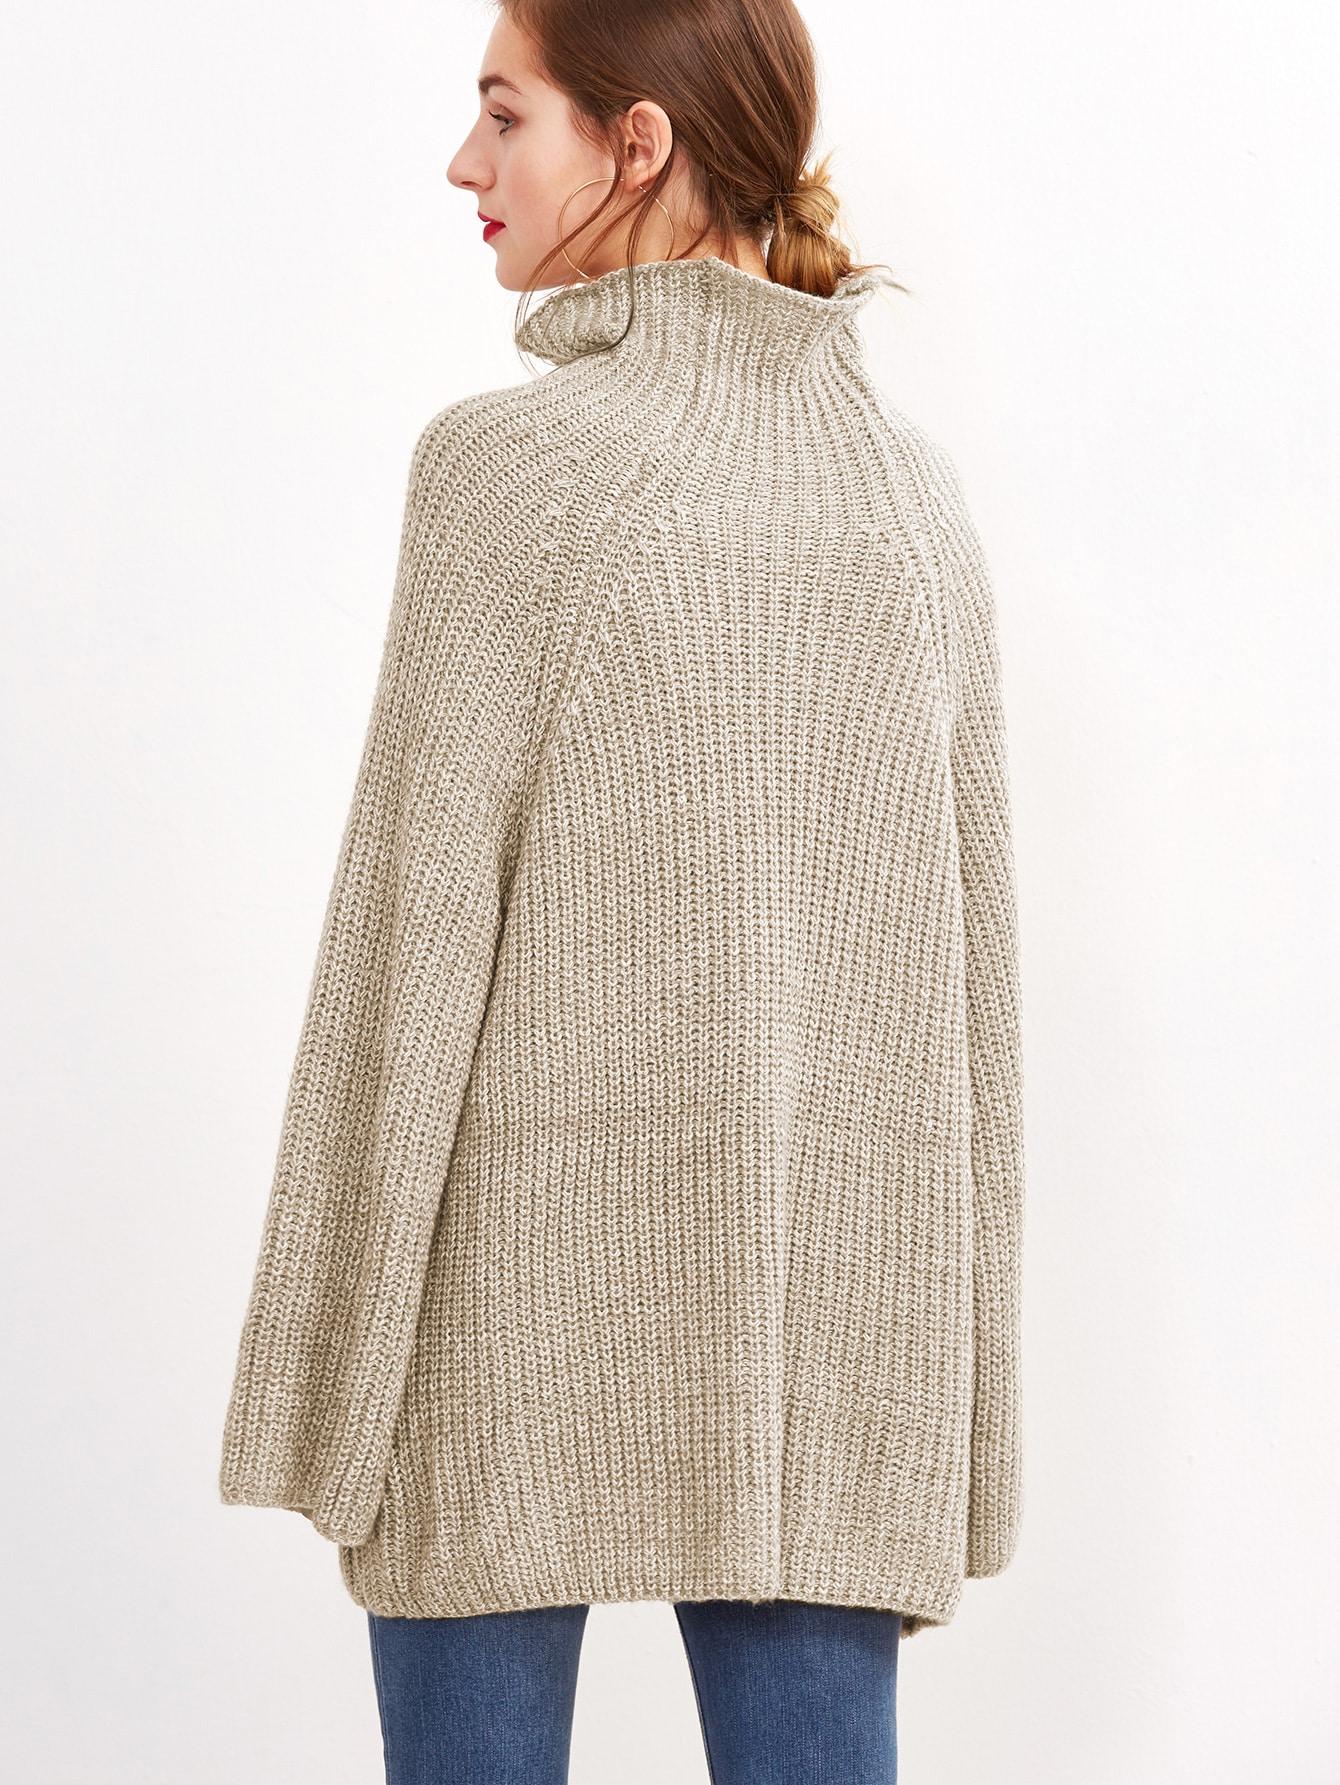 sweater161020102_2